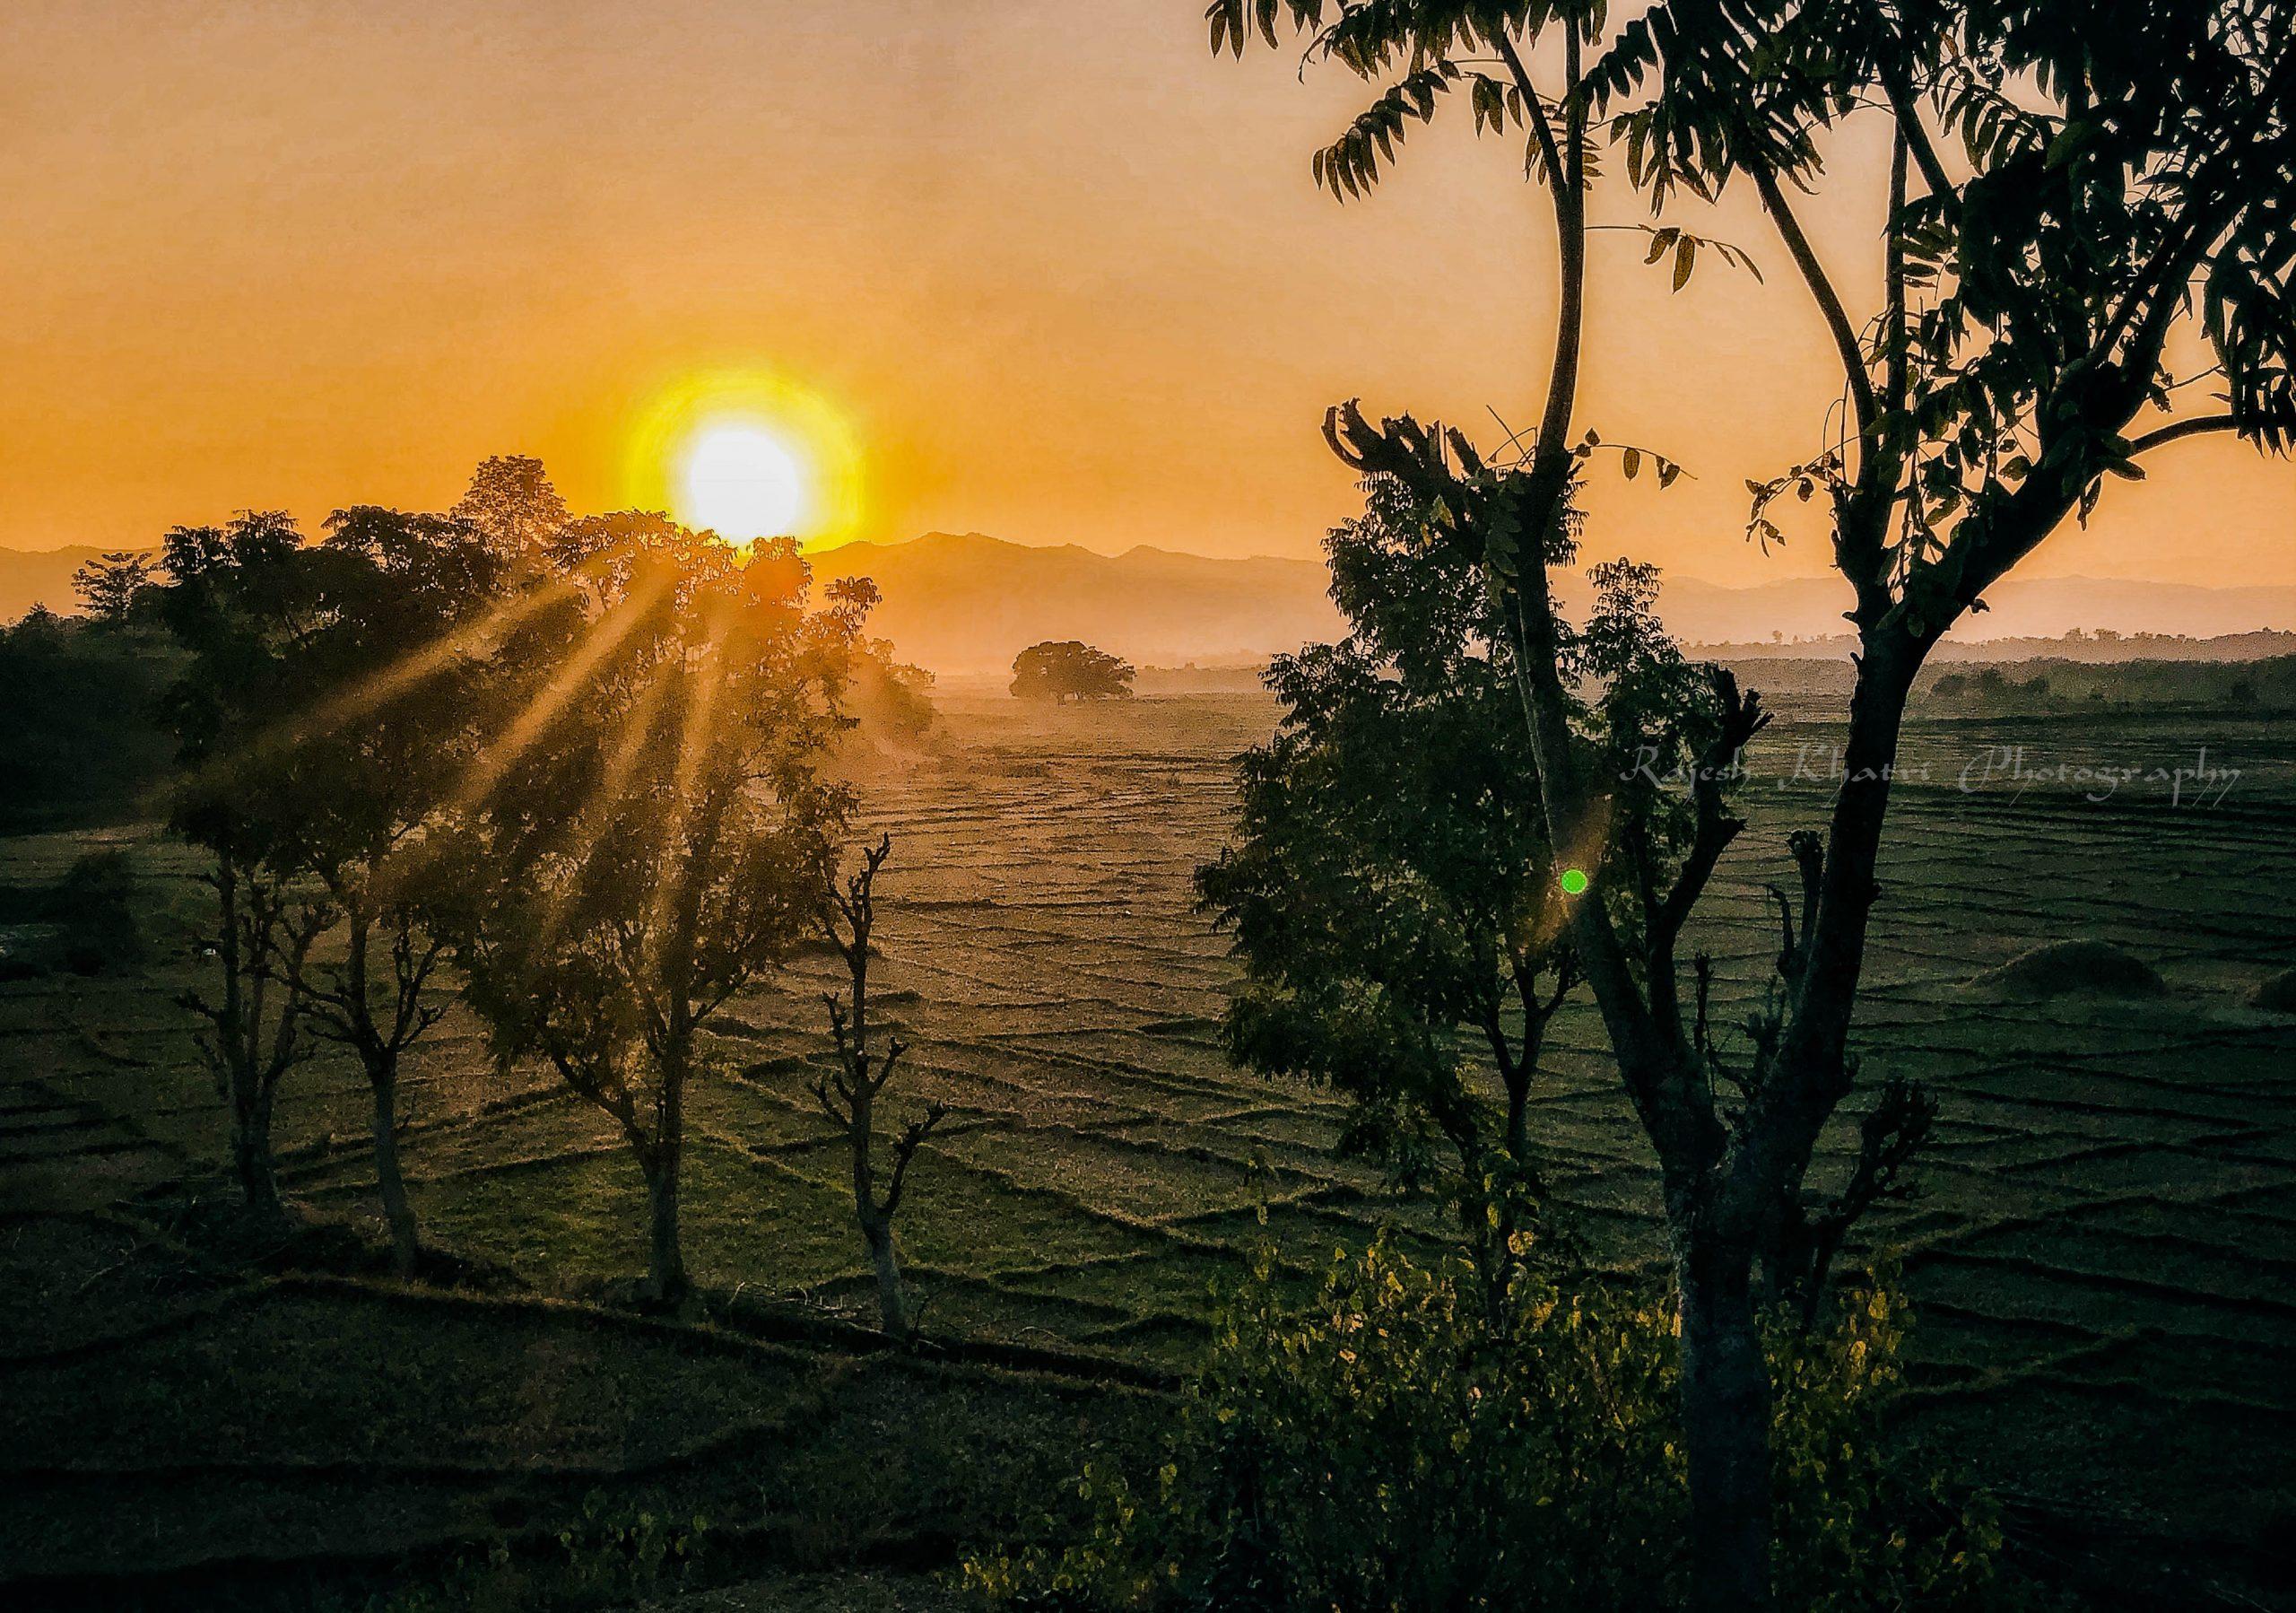 New Best Image Full Hd Wallpaper Best Images Download Frame Nepal Frame Nepal